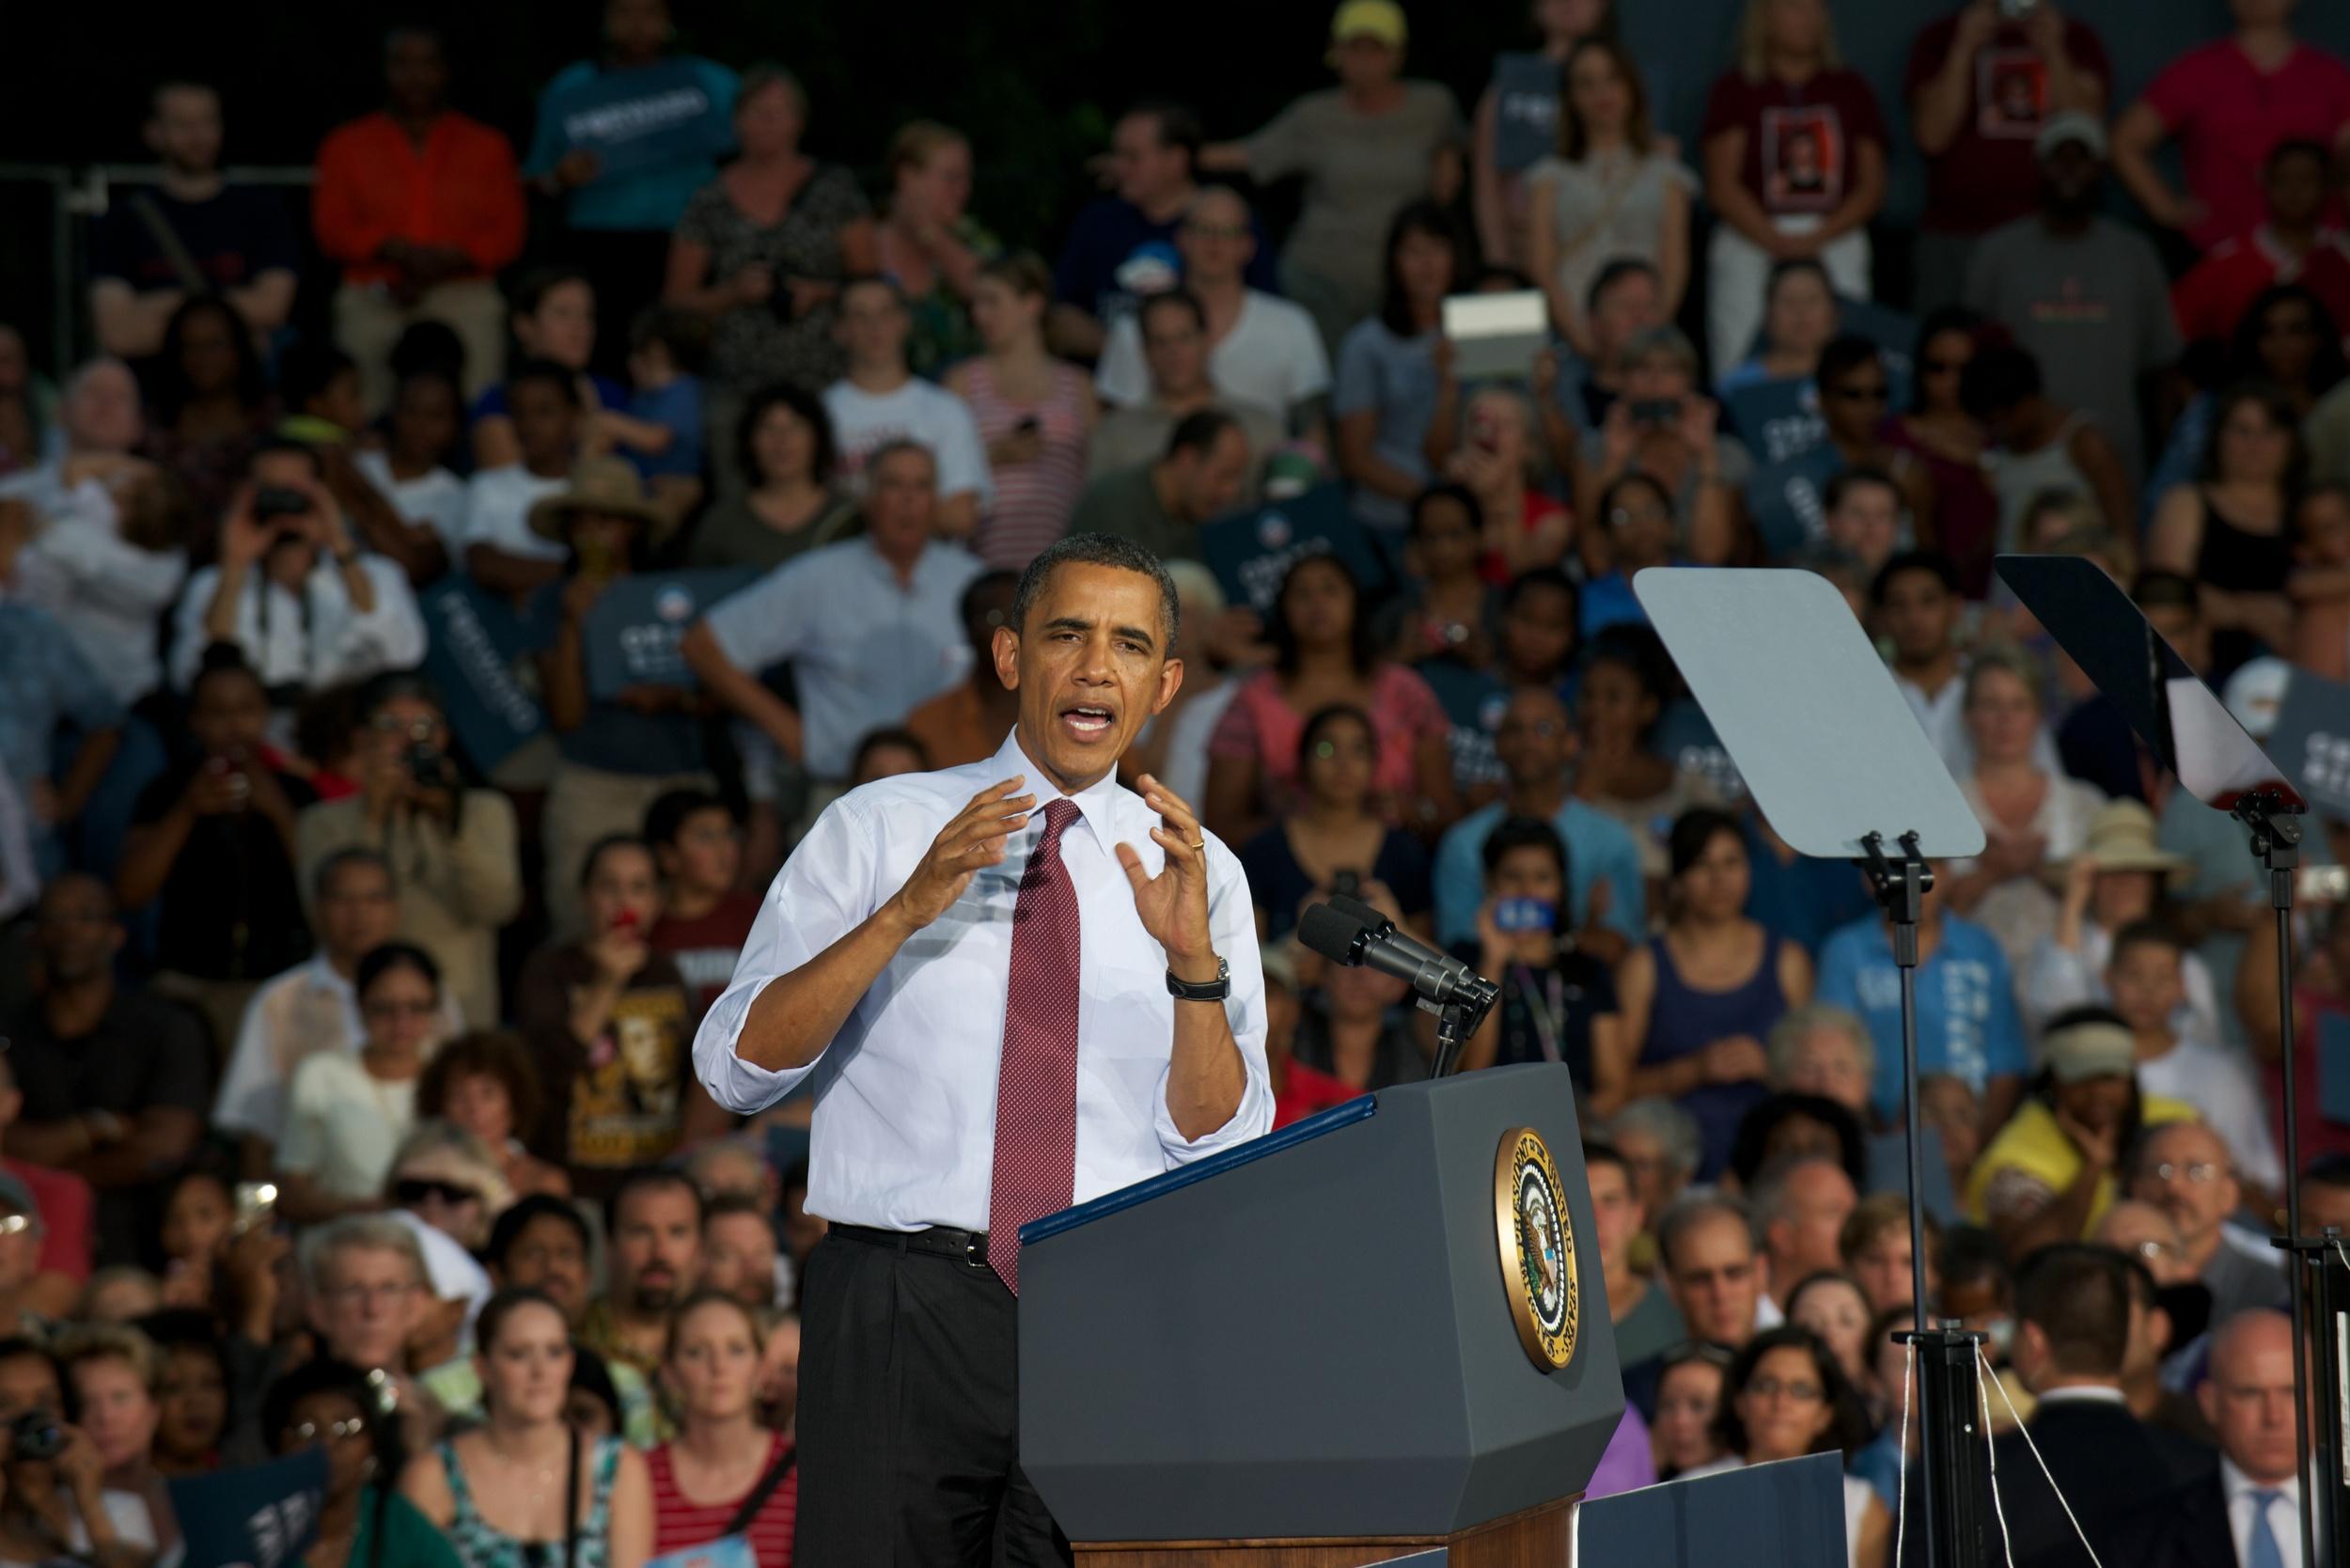 2012_08_Obama_VA_1081.jpg